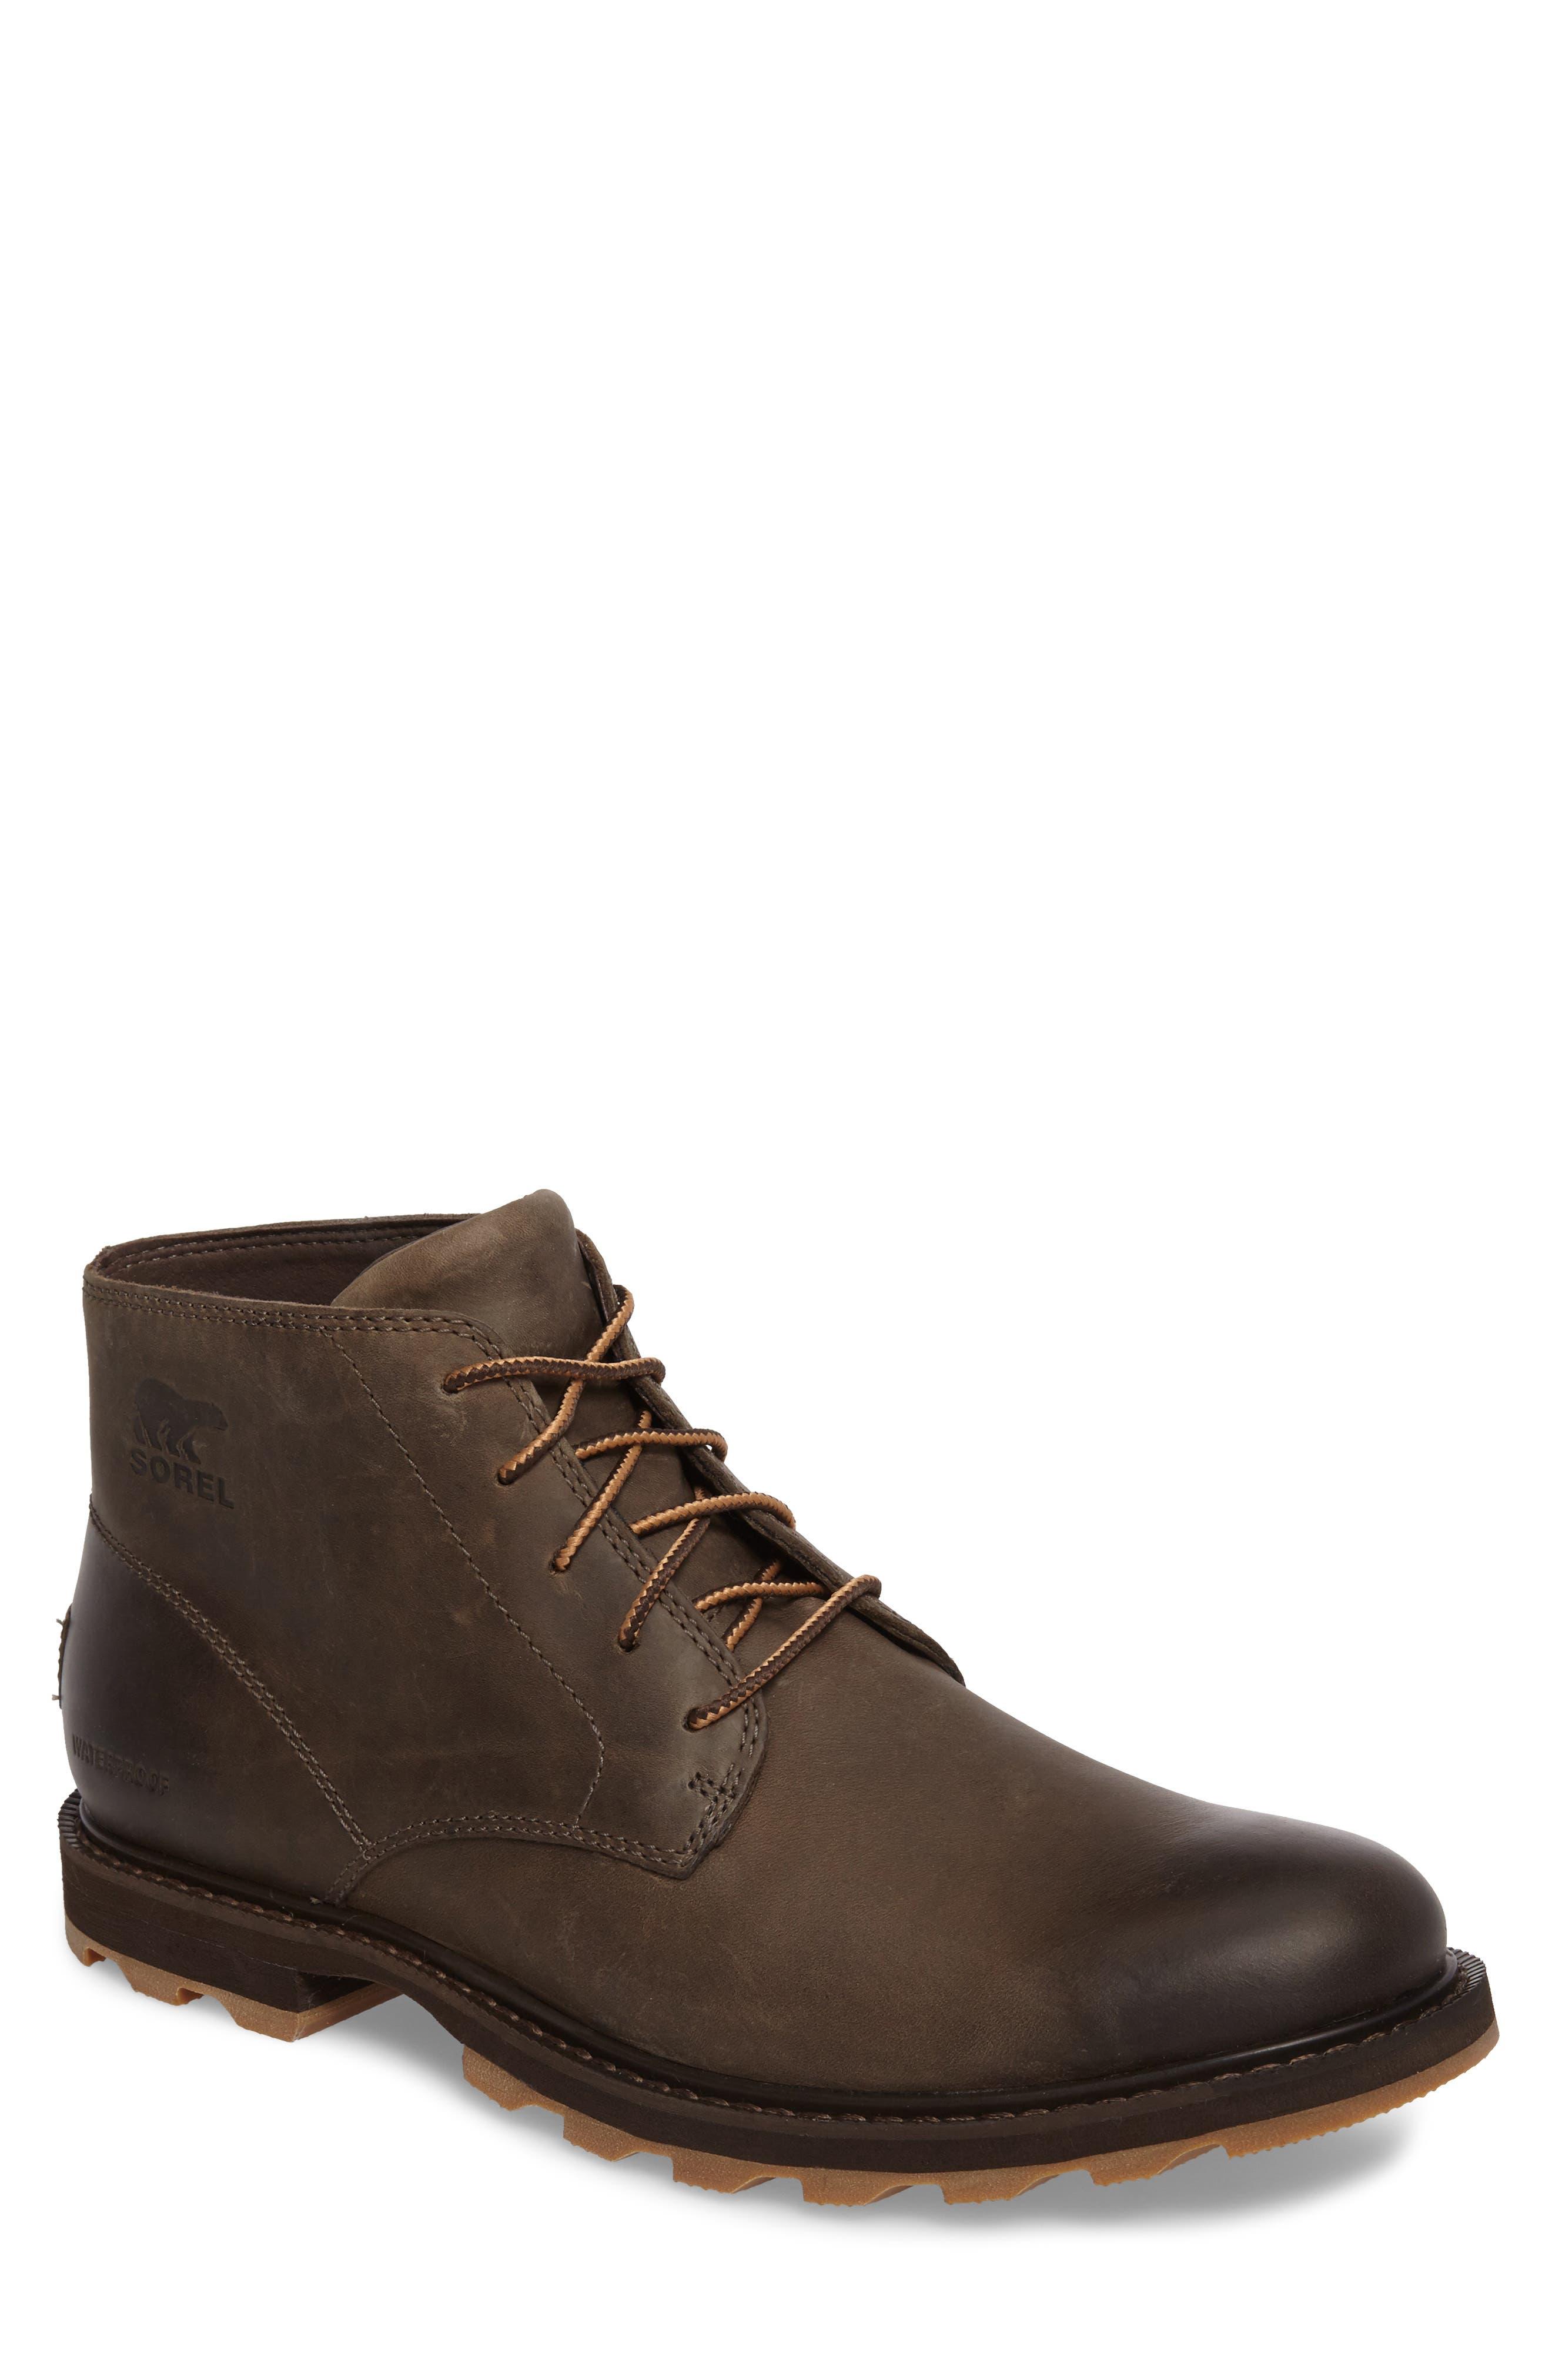 Madson Waterproof Boot,                         Main,                         color, MAJOR/ CORDOVAN